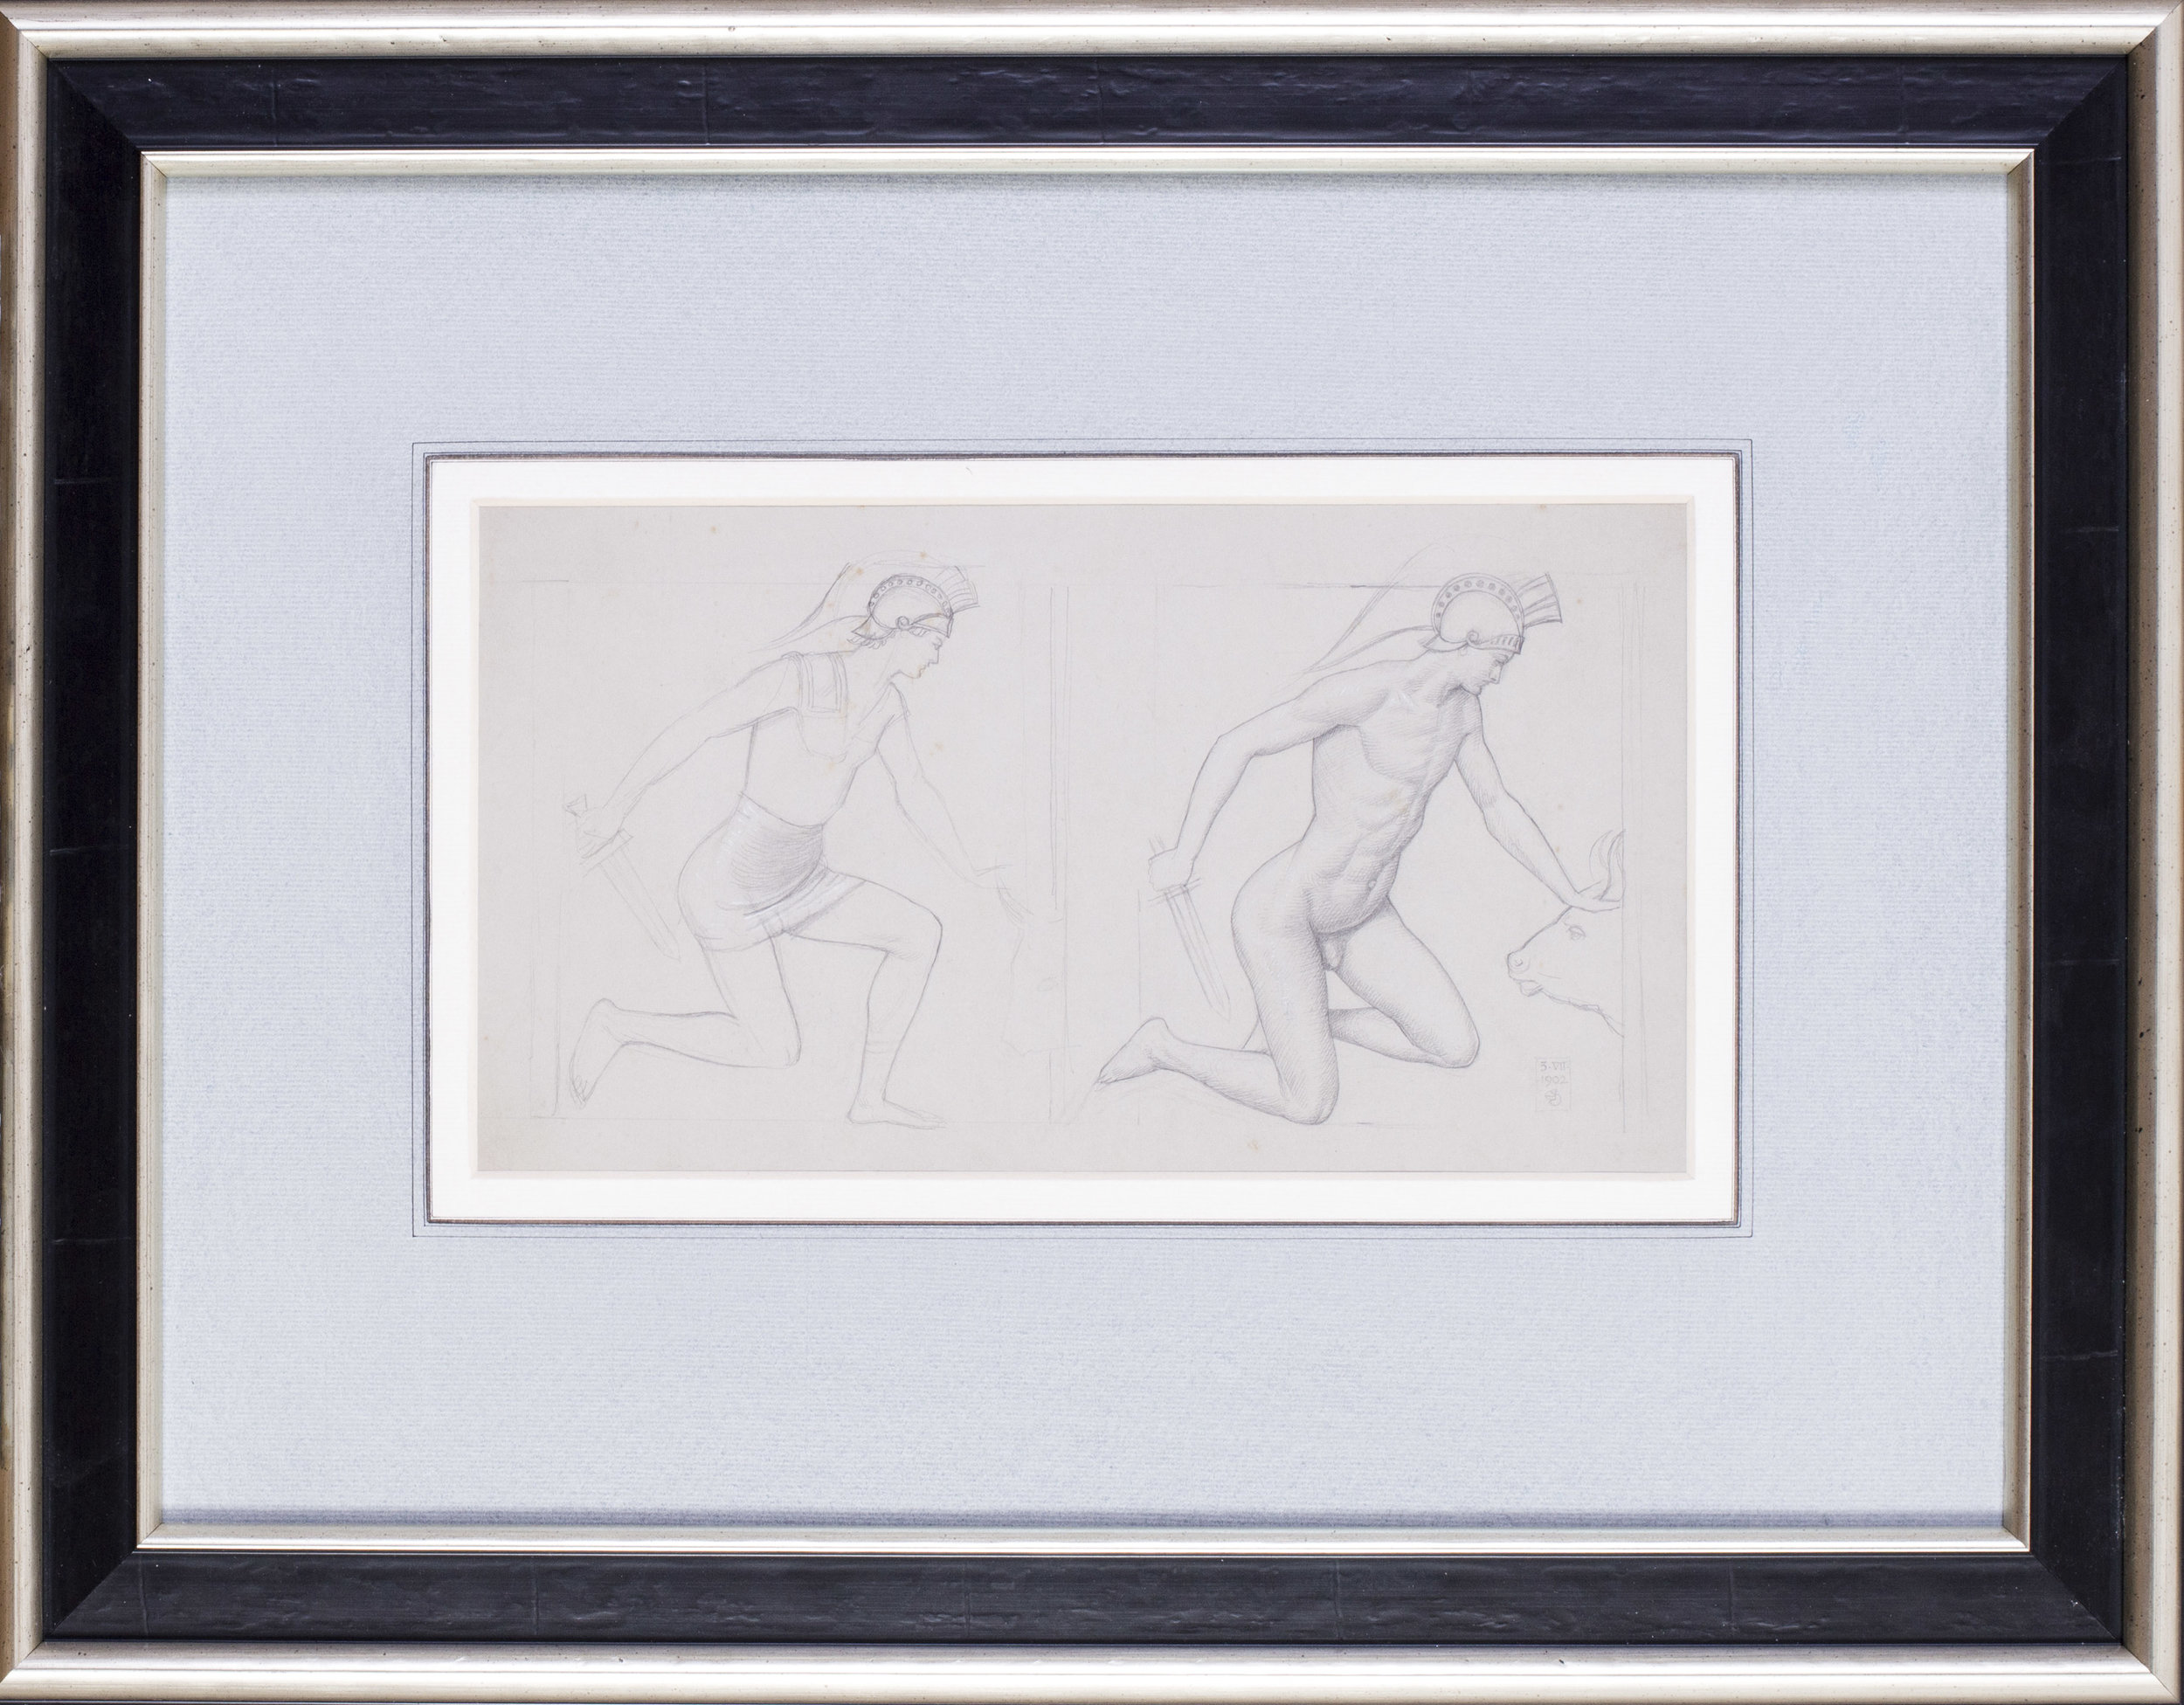 Joseph Edward Southall    Study for 'Theseus and the Minotaur'   Price: £950